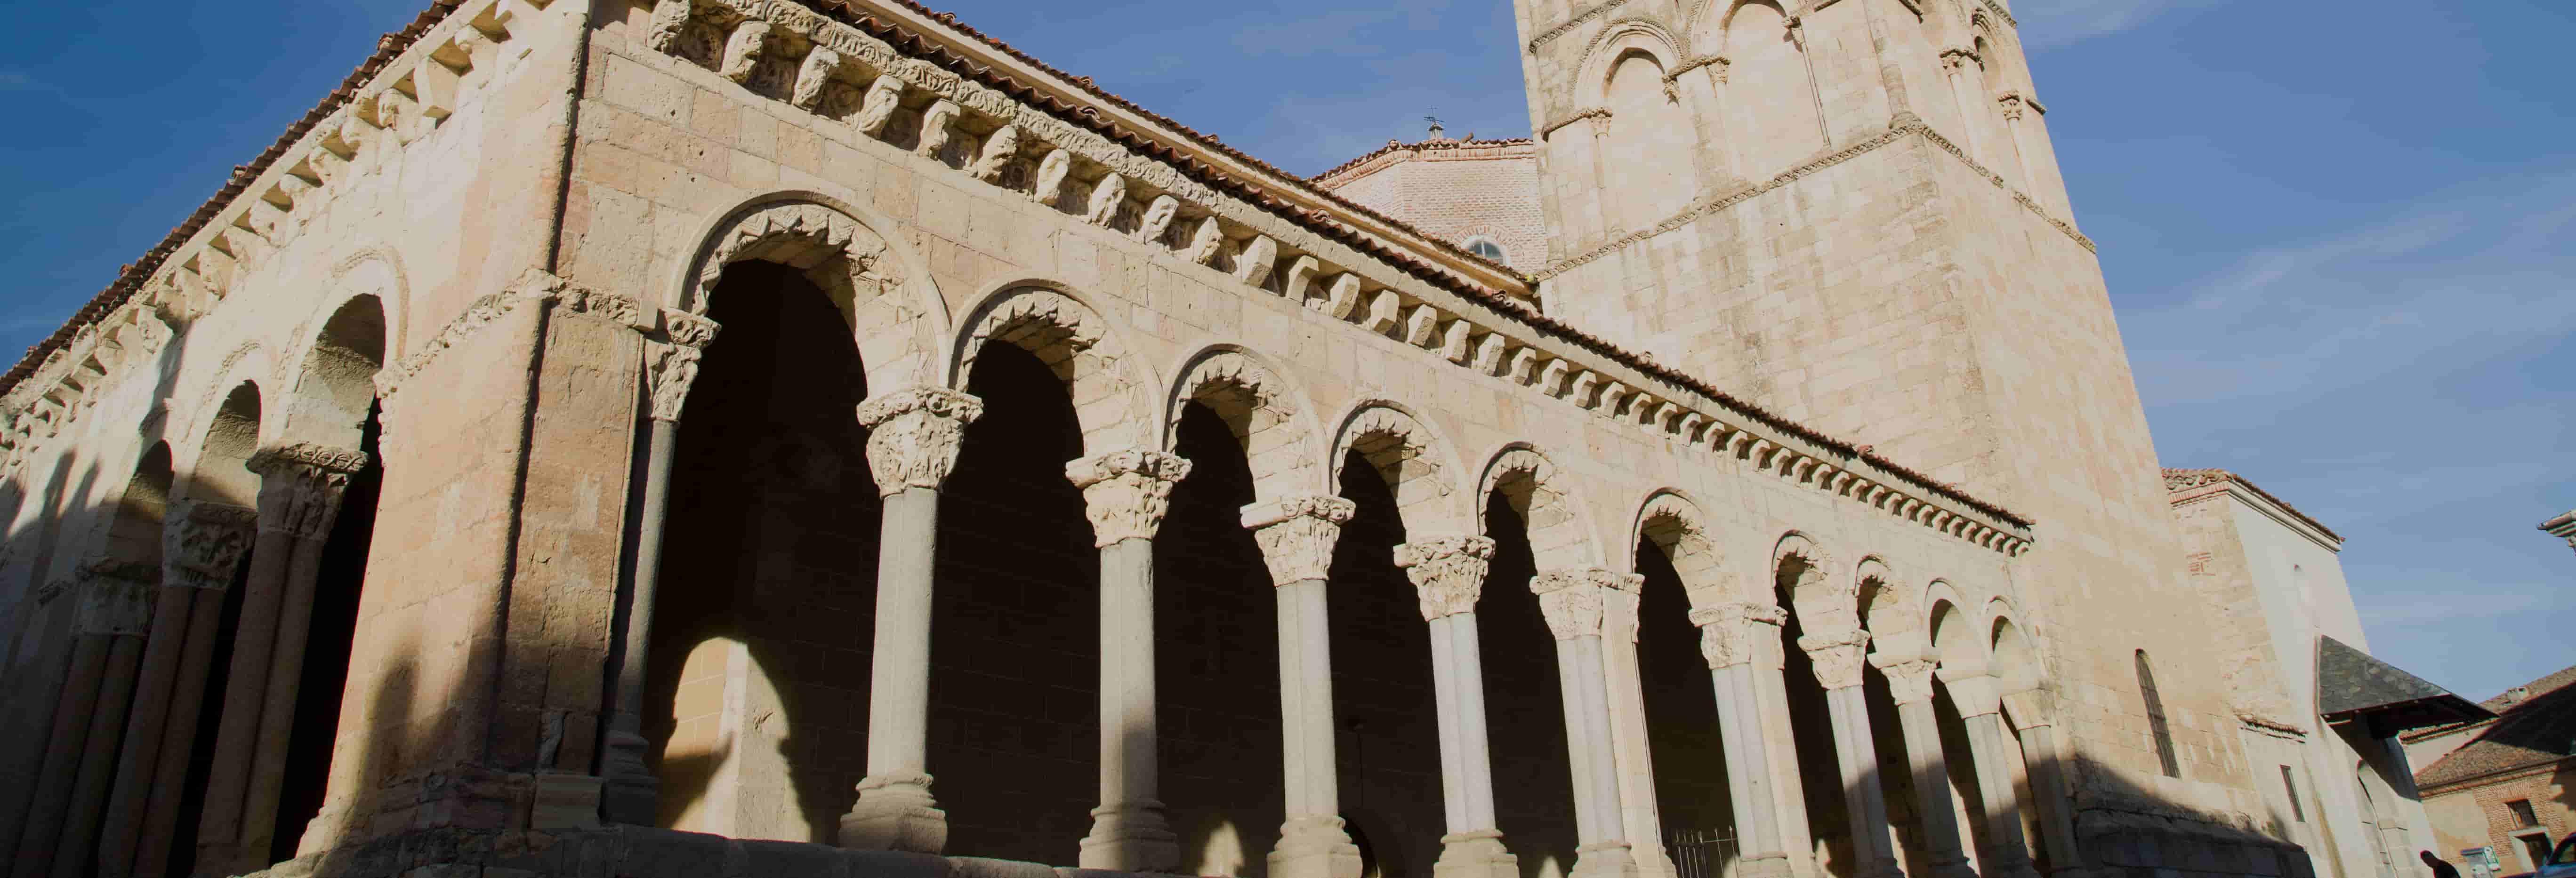 Tour por la Segovia románica